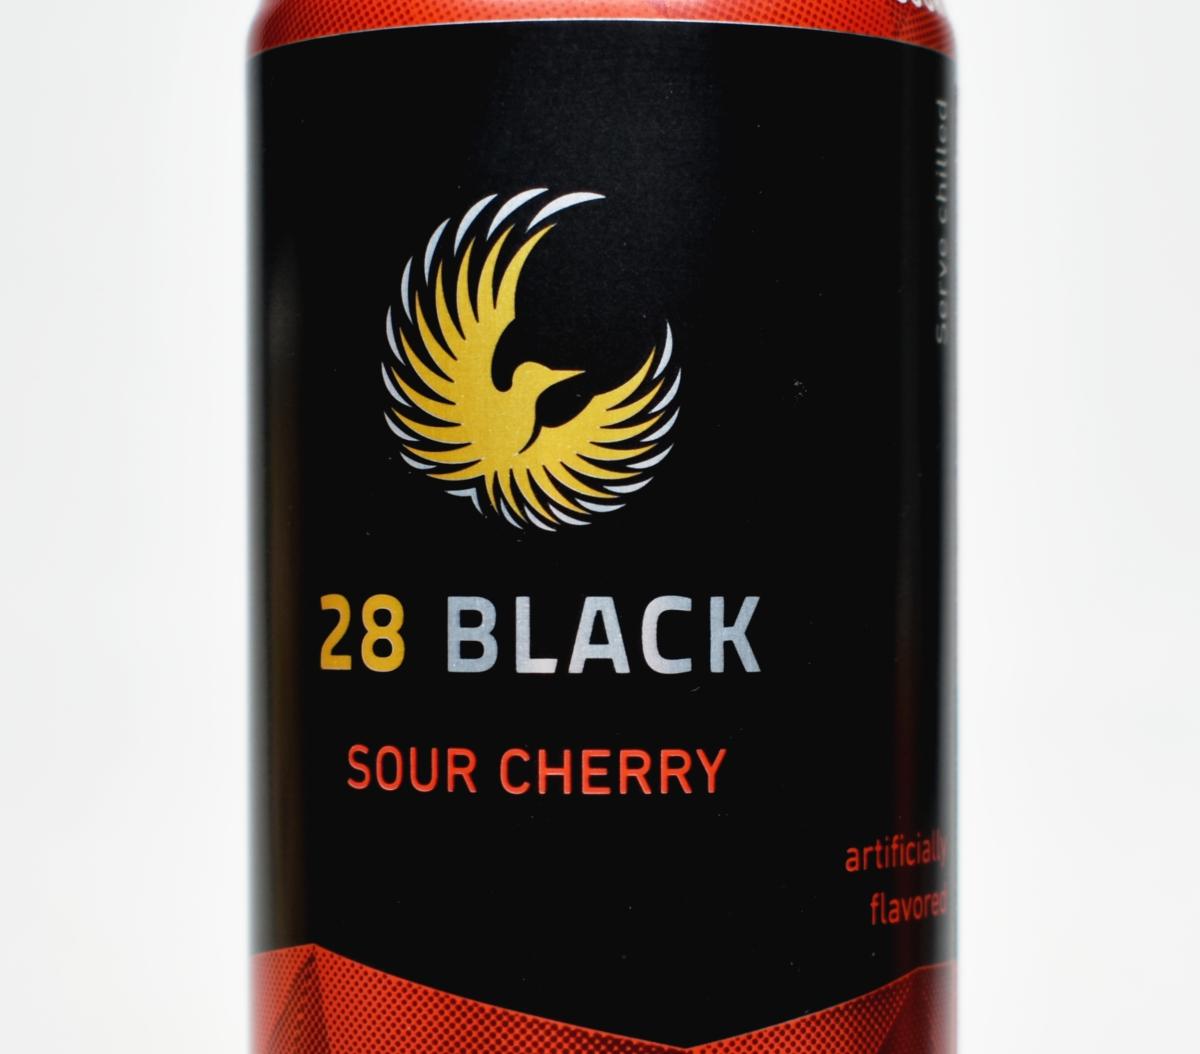 28 BLACK SOUR CHERRY,サワーチェリー